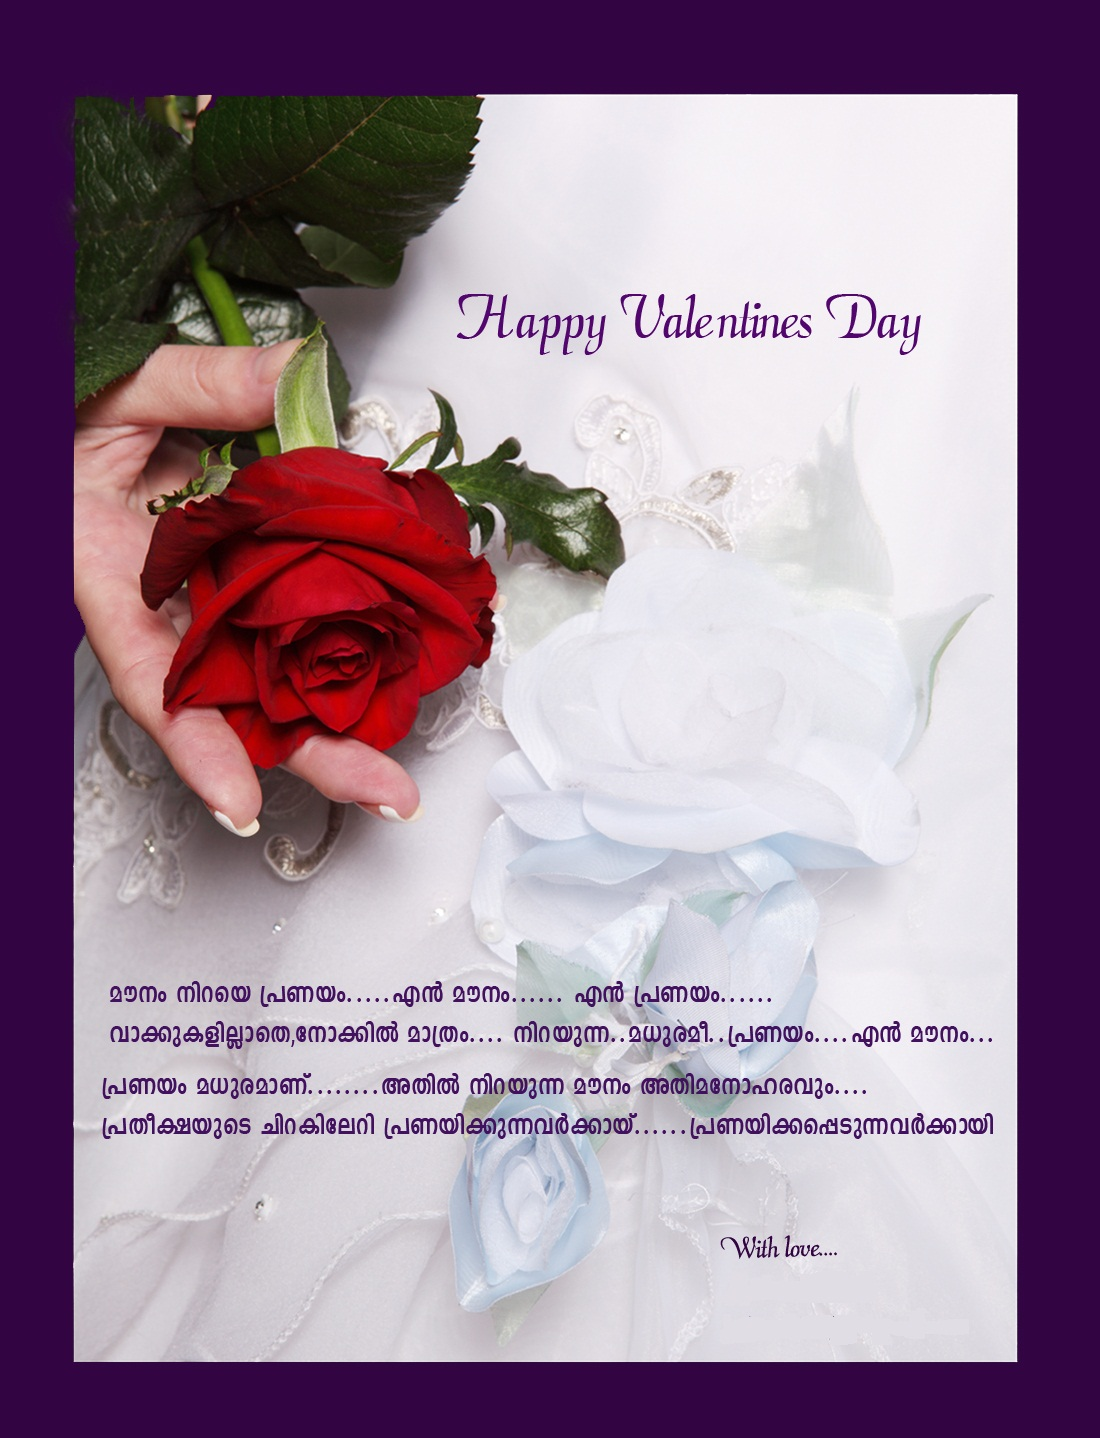 http://3.bp.blogspot.com/-WSaseTtRnts/TVSw6iwh1EI/AAAAAAAAFHo/YYN-ADj-Fhs/s1600/valentines2%20online.jpg